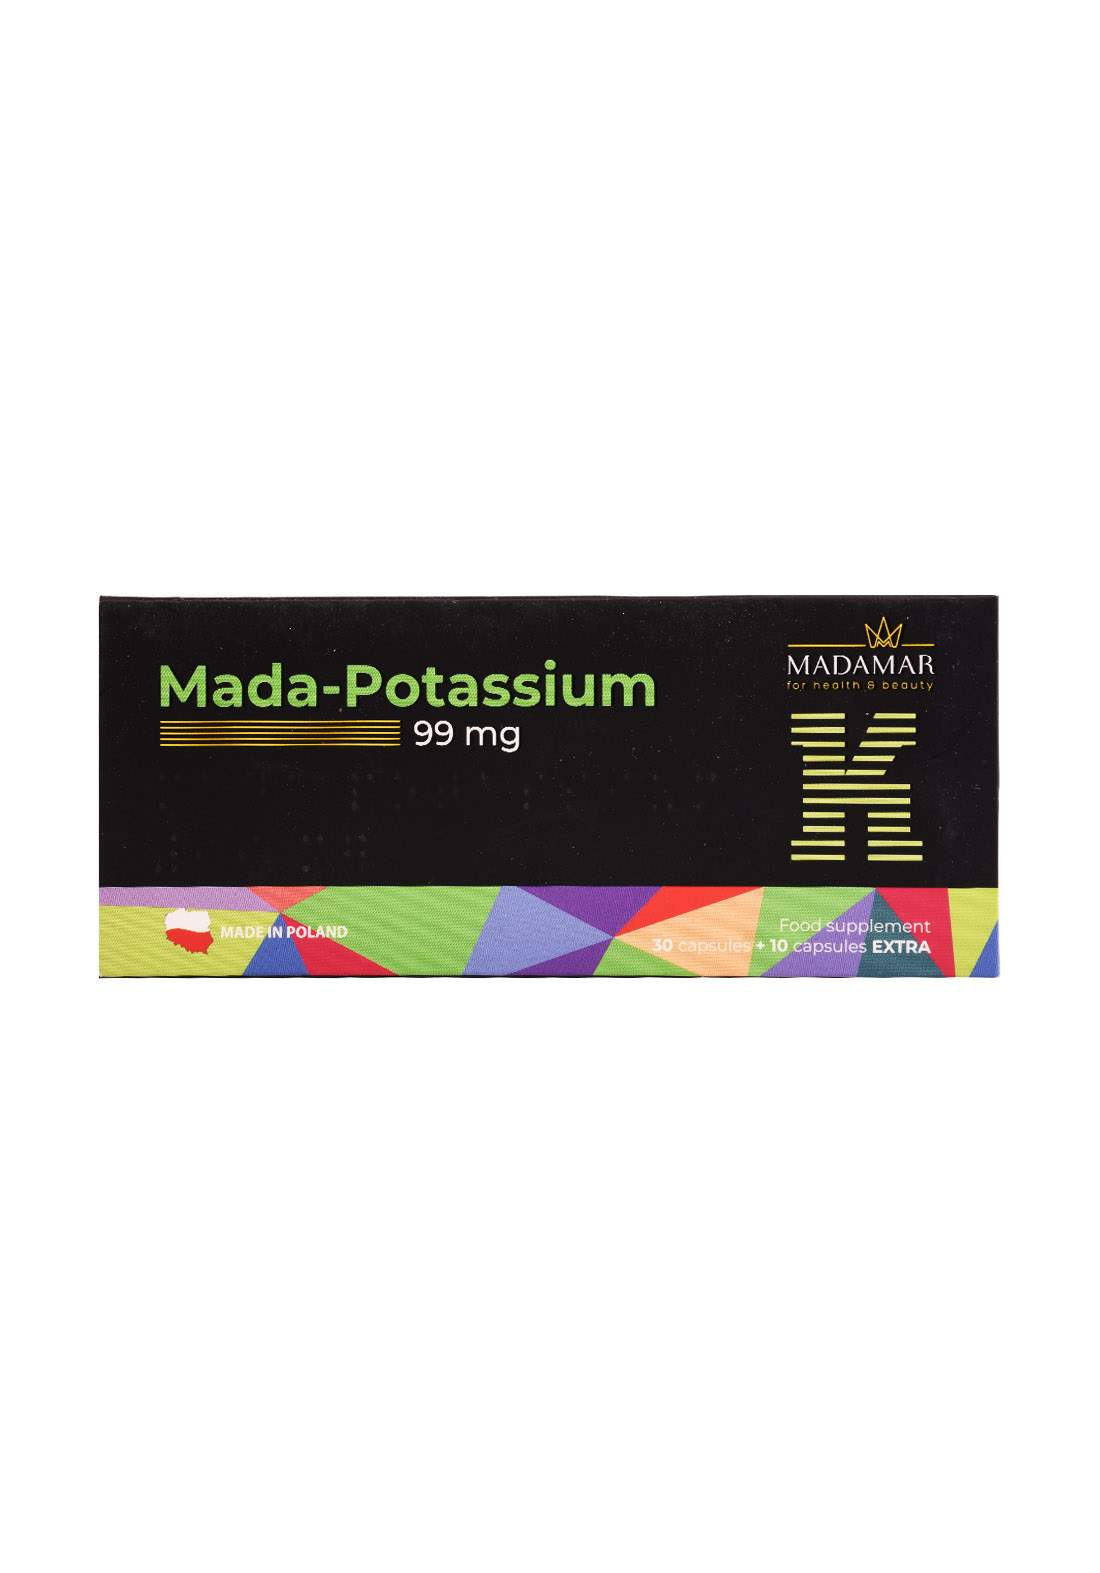 Madamar Mada-Potassium 99 mg   30capsule +10capsules Extra مكمل غذائي